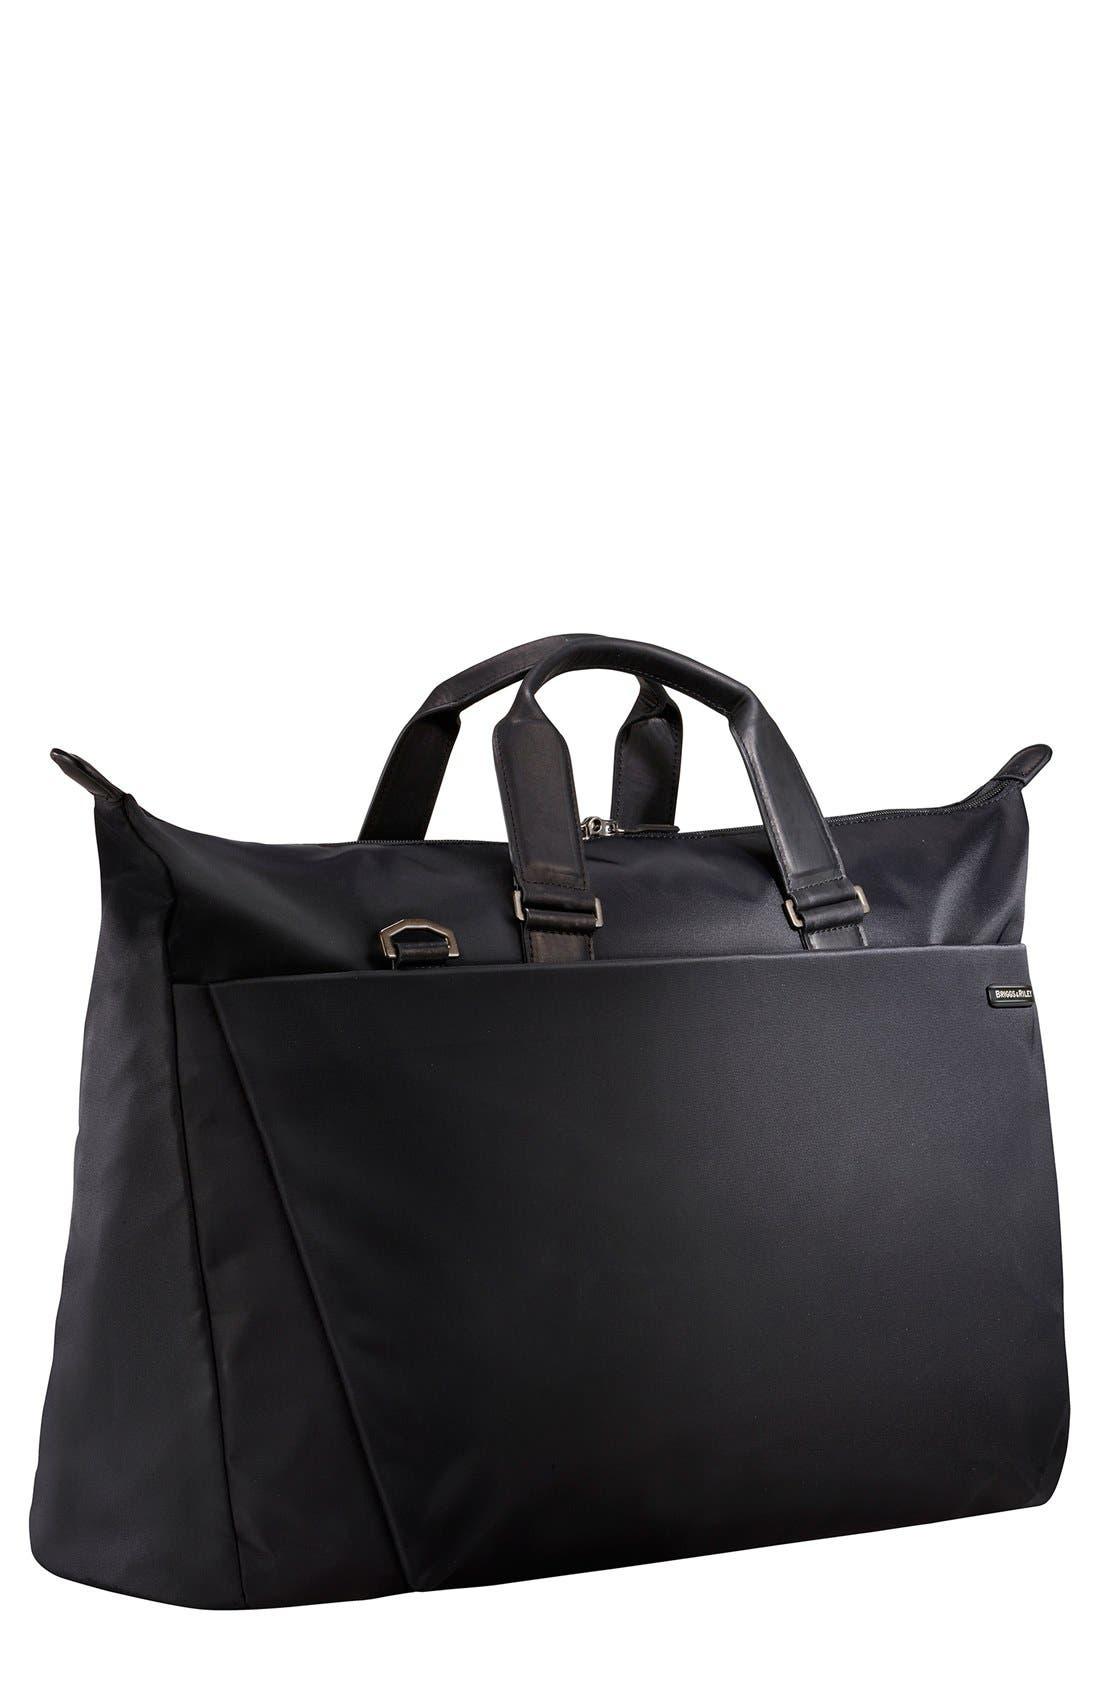 Alternate Image 1 Selected - Briggs & Riley Sympatico 22-Inch Duffel Bag